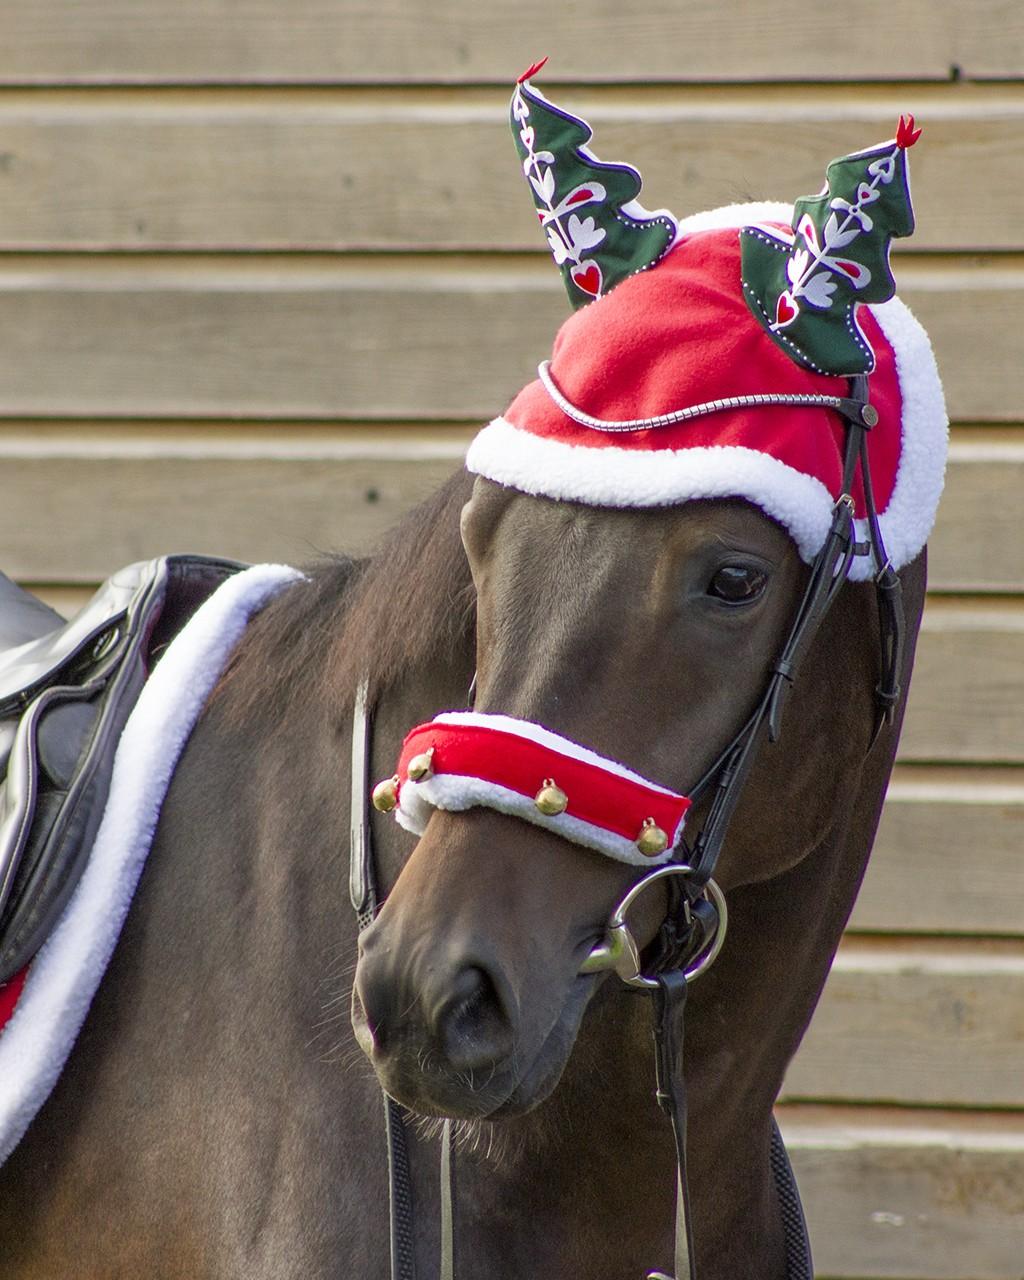 Ørehette juletre